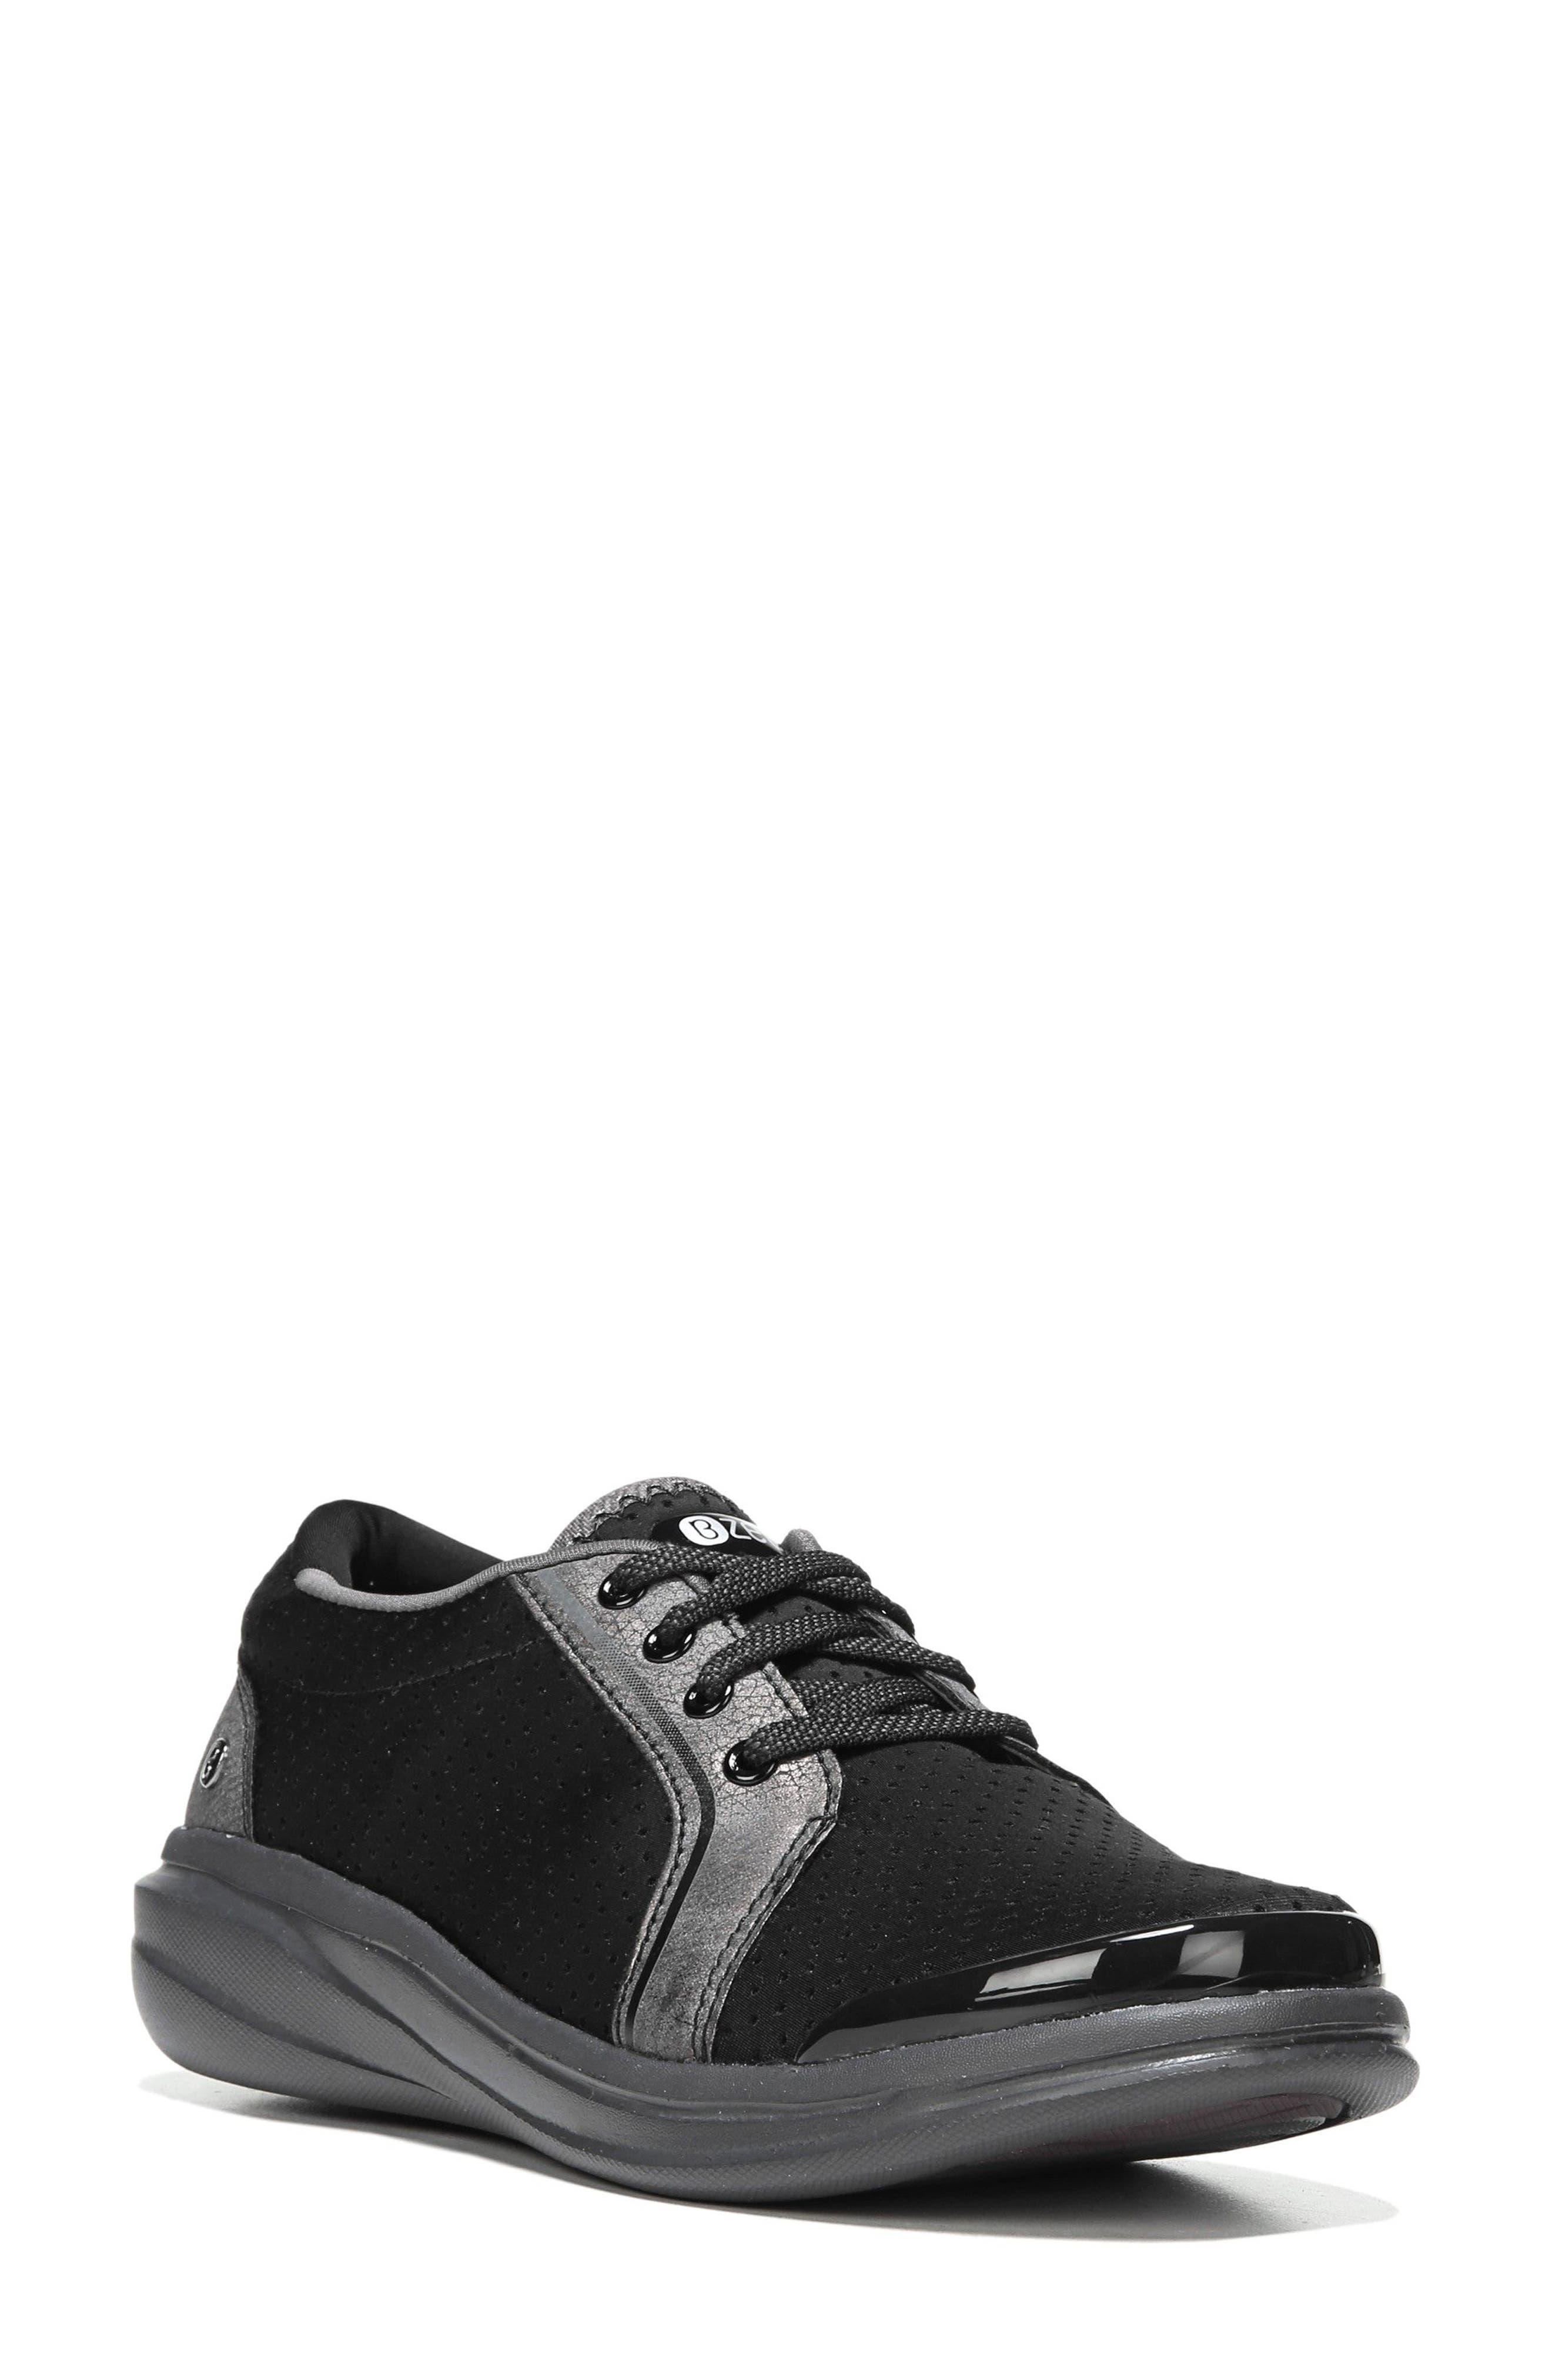 Capri Sneaker,                             Main thumbnail 1, color,                             003